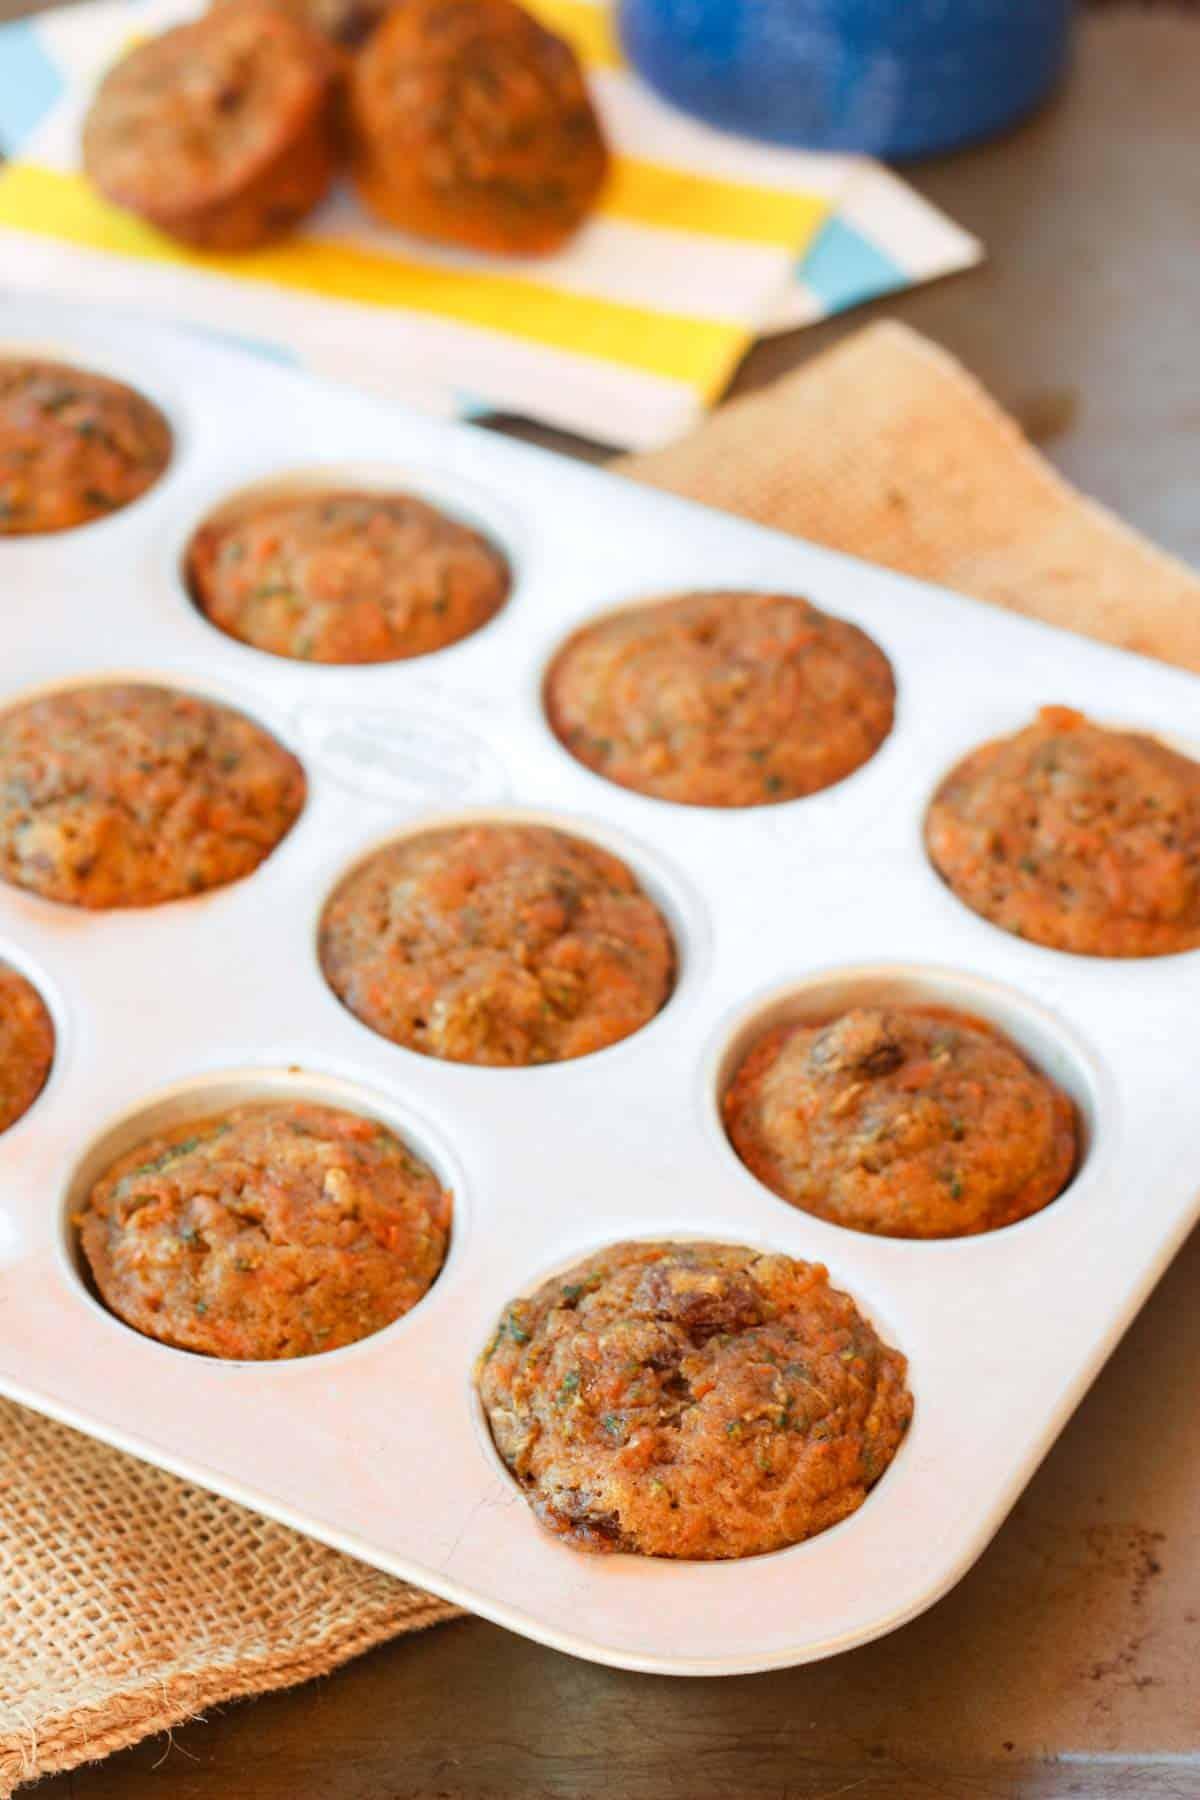 A mini muffin tin filled with zucchini carrot muffins